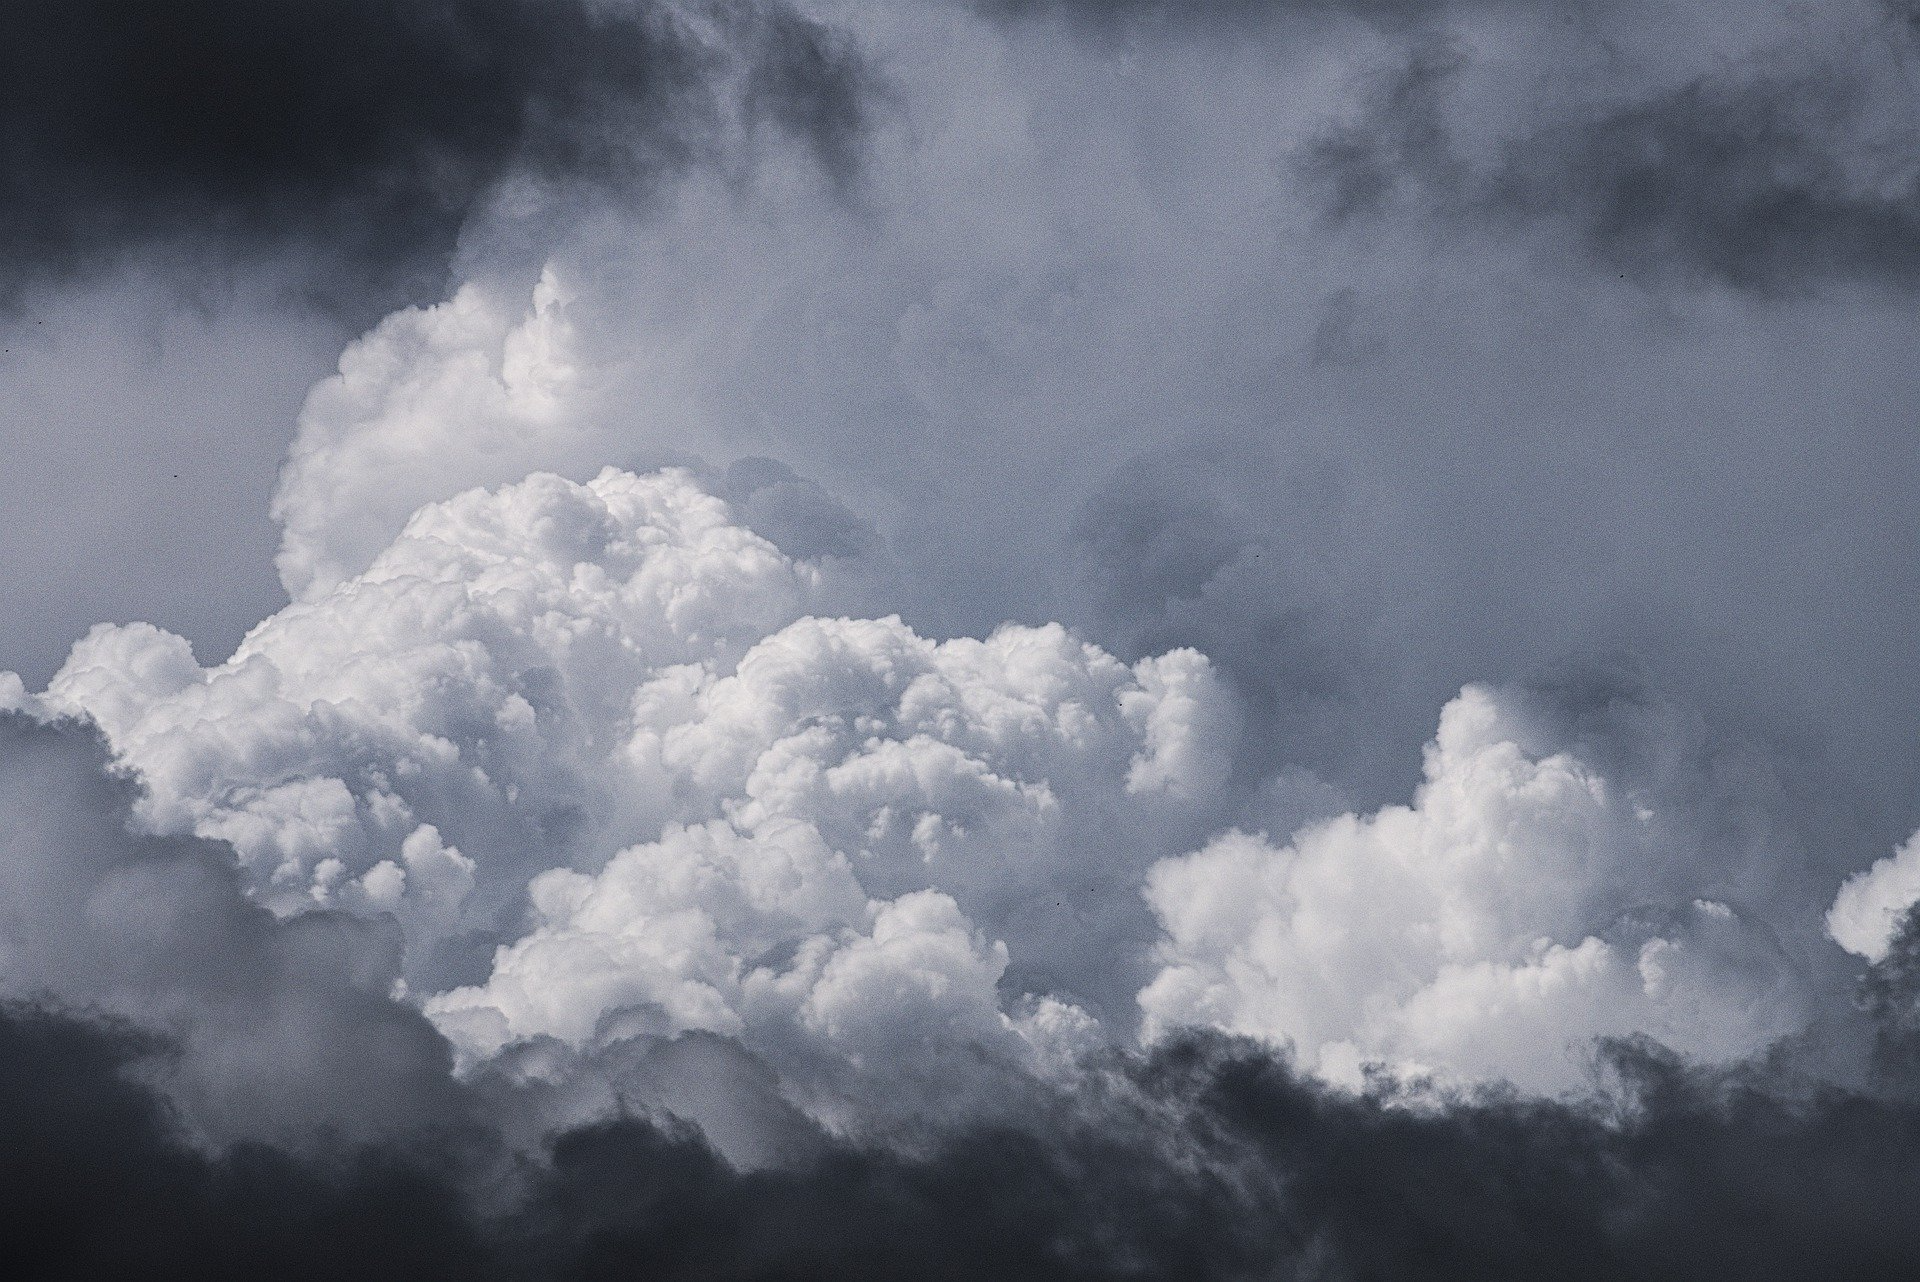 clouds-5368444_1920.jpg